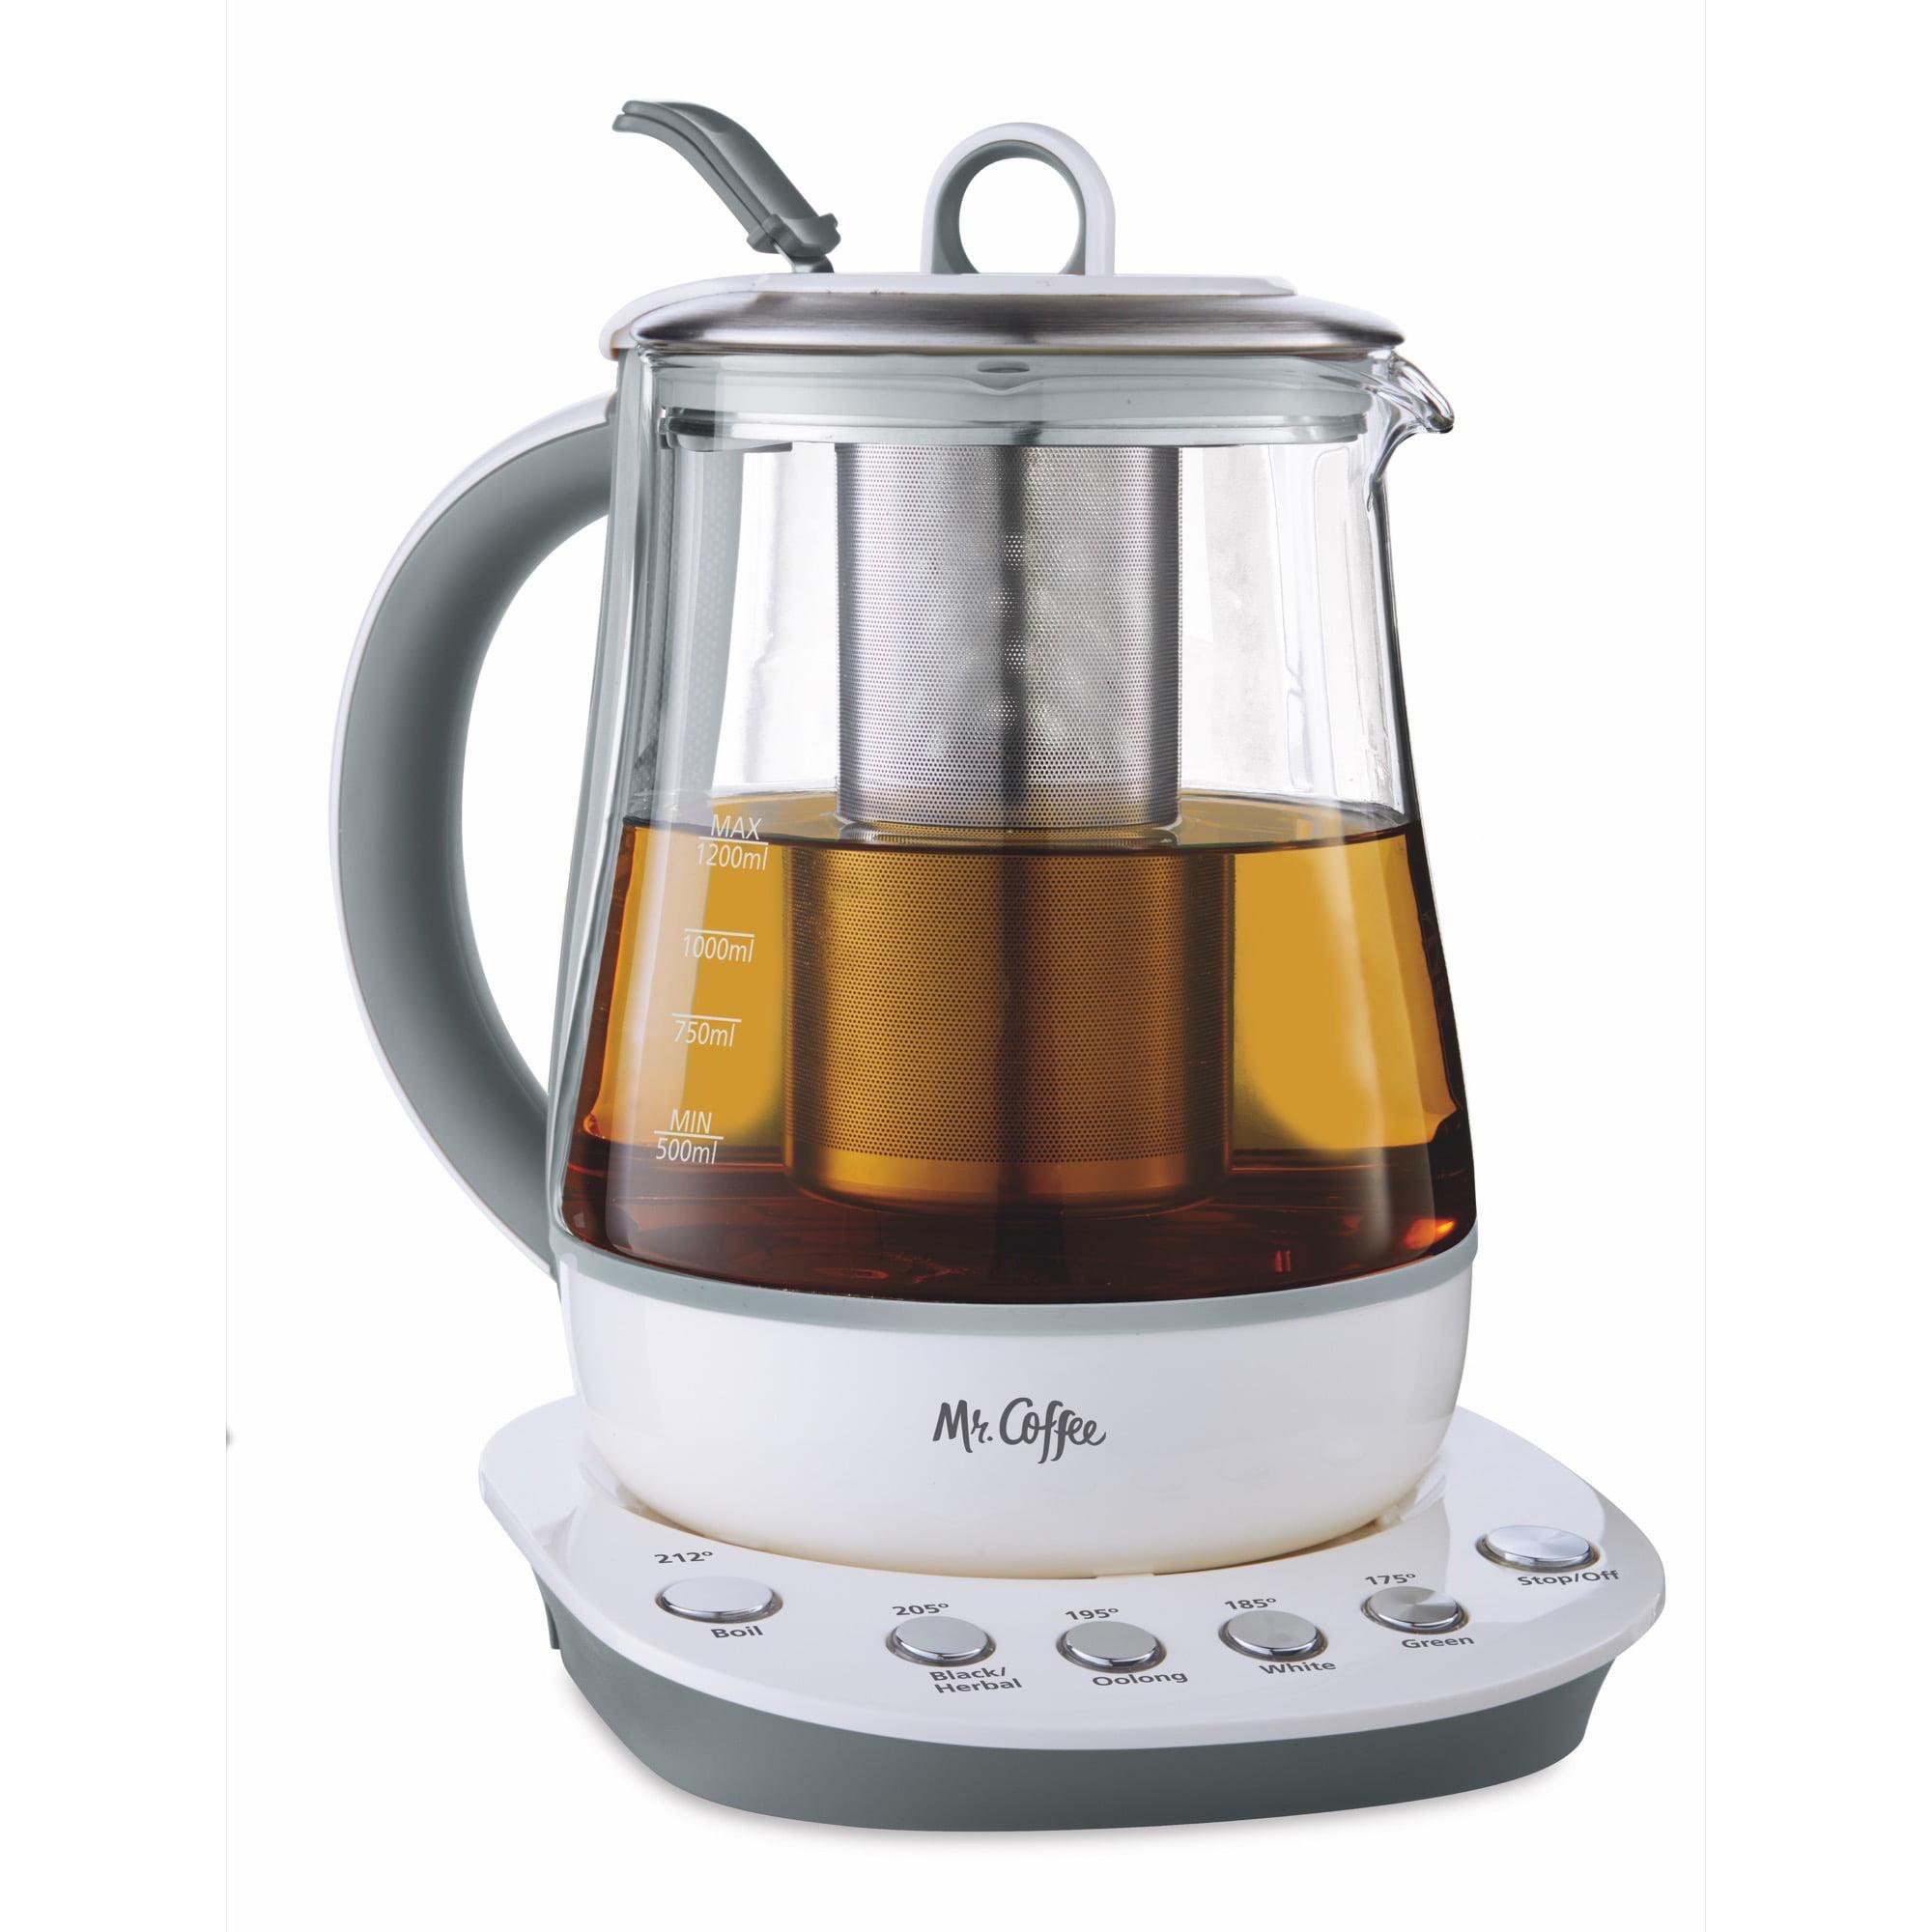 Mr. Coffee Hot Tea Maker and Kettle, White - Walmart.com ...